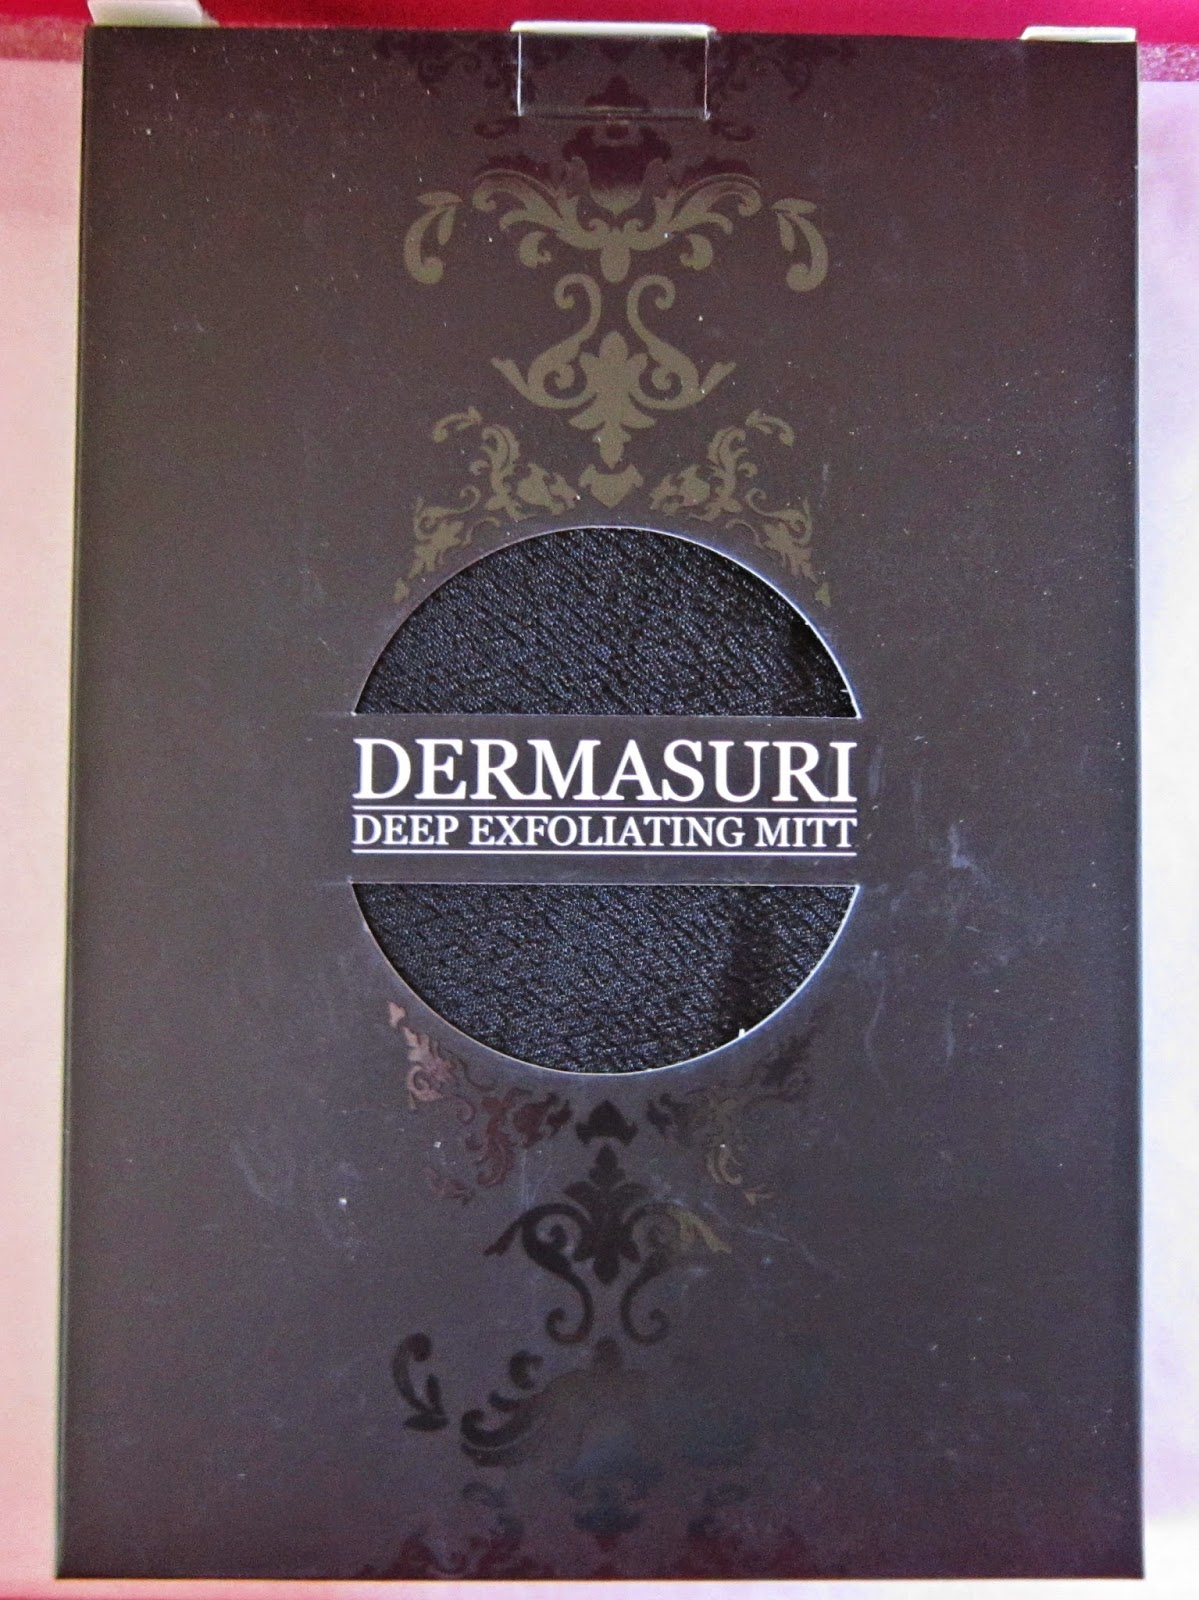 Dermasuri Deep Exfoliating Mitt